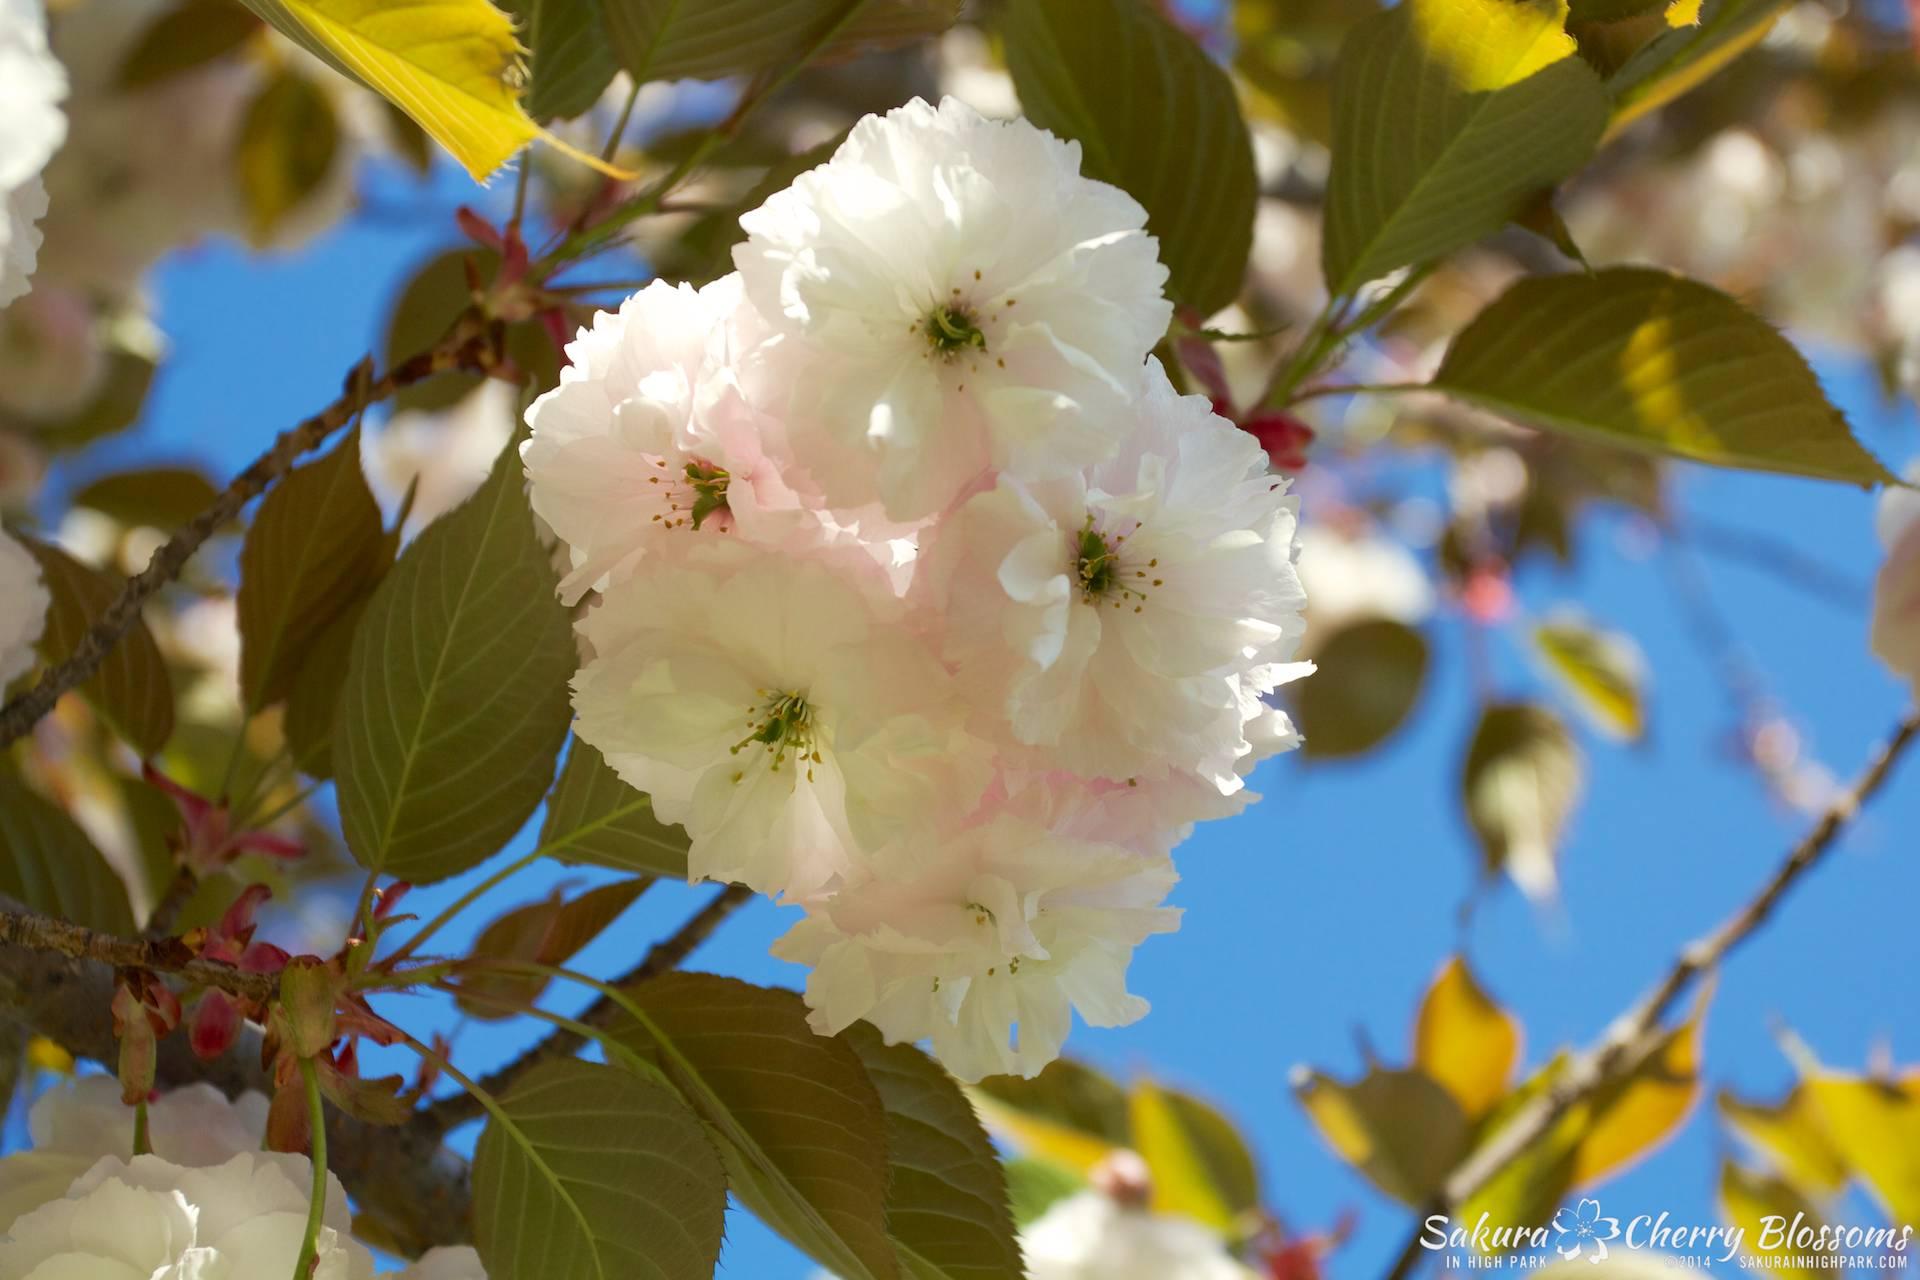 SakuraInHighPark-May2414-409.jpg